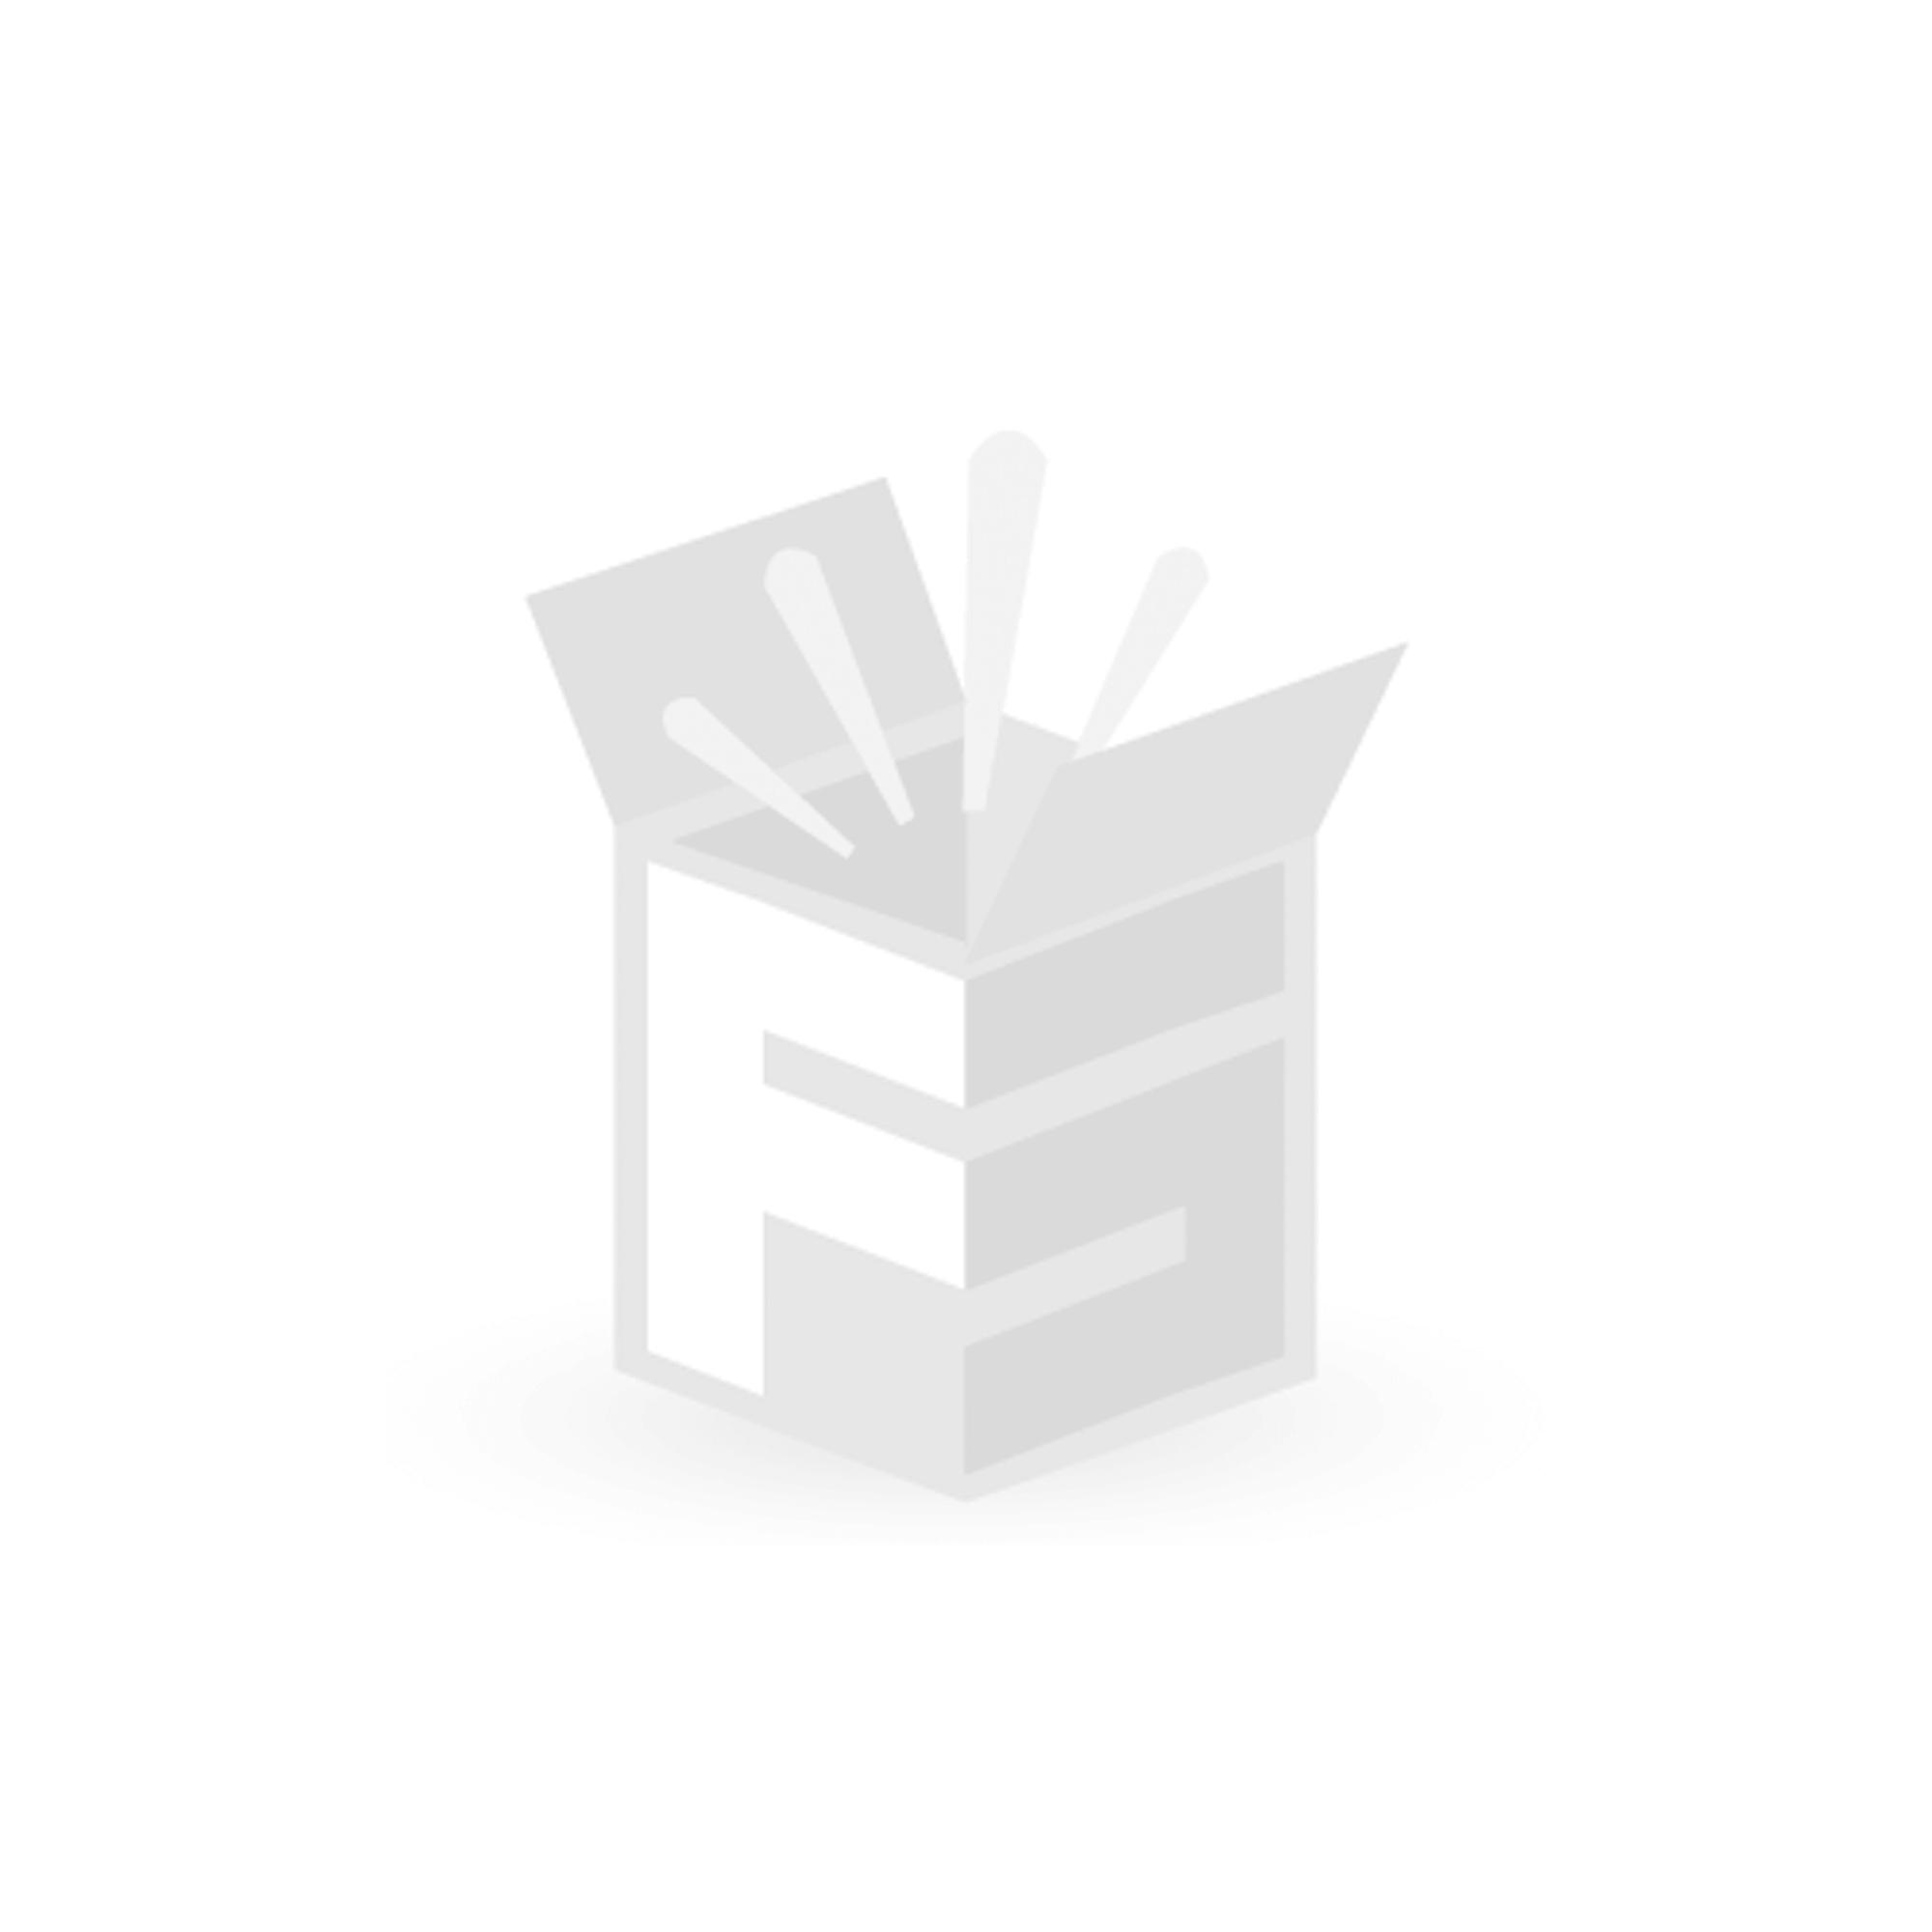 Kibernetik Arbeitshandschuhe Grösse L, Polyester, 12 Paar